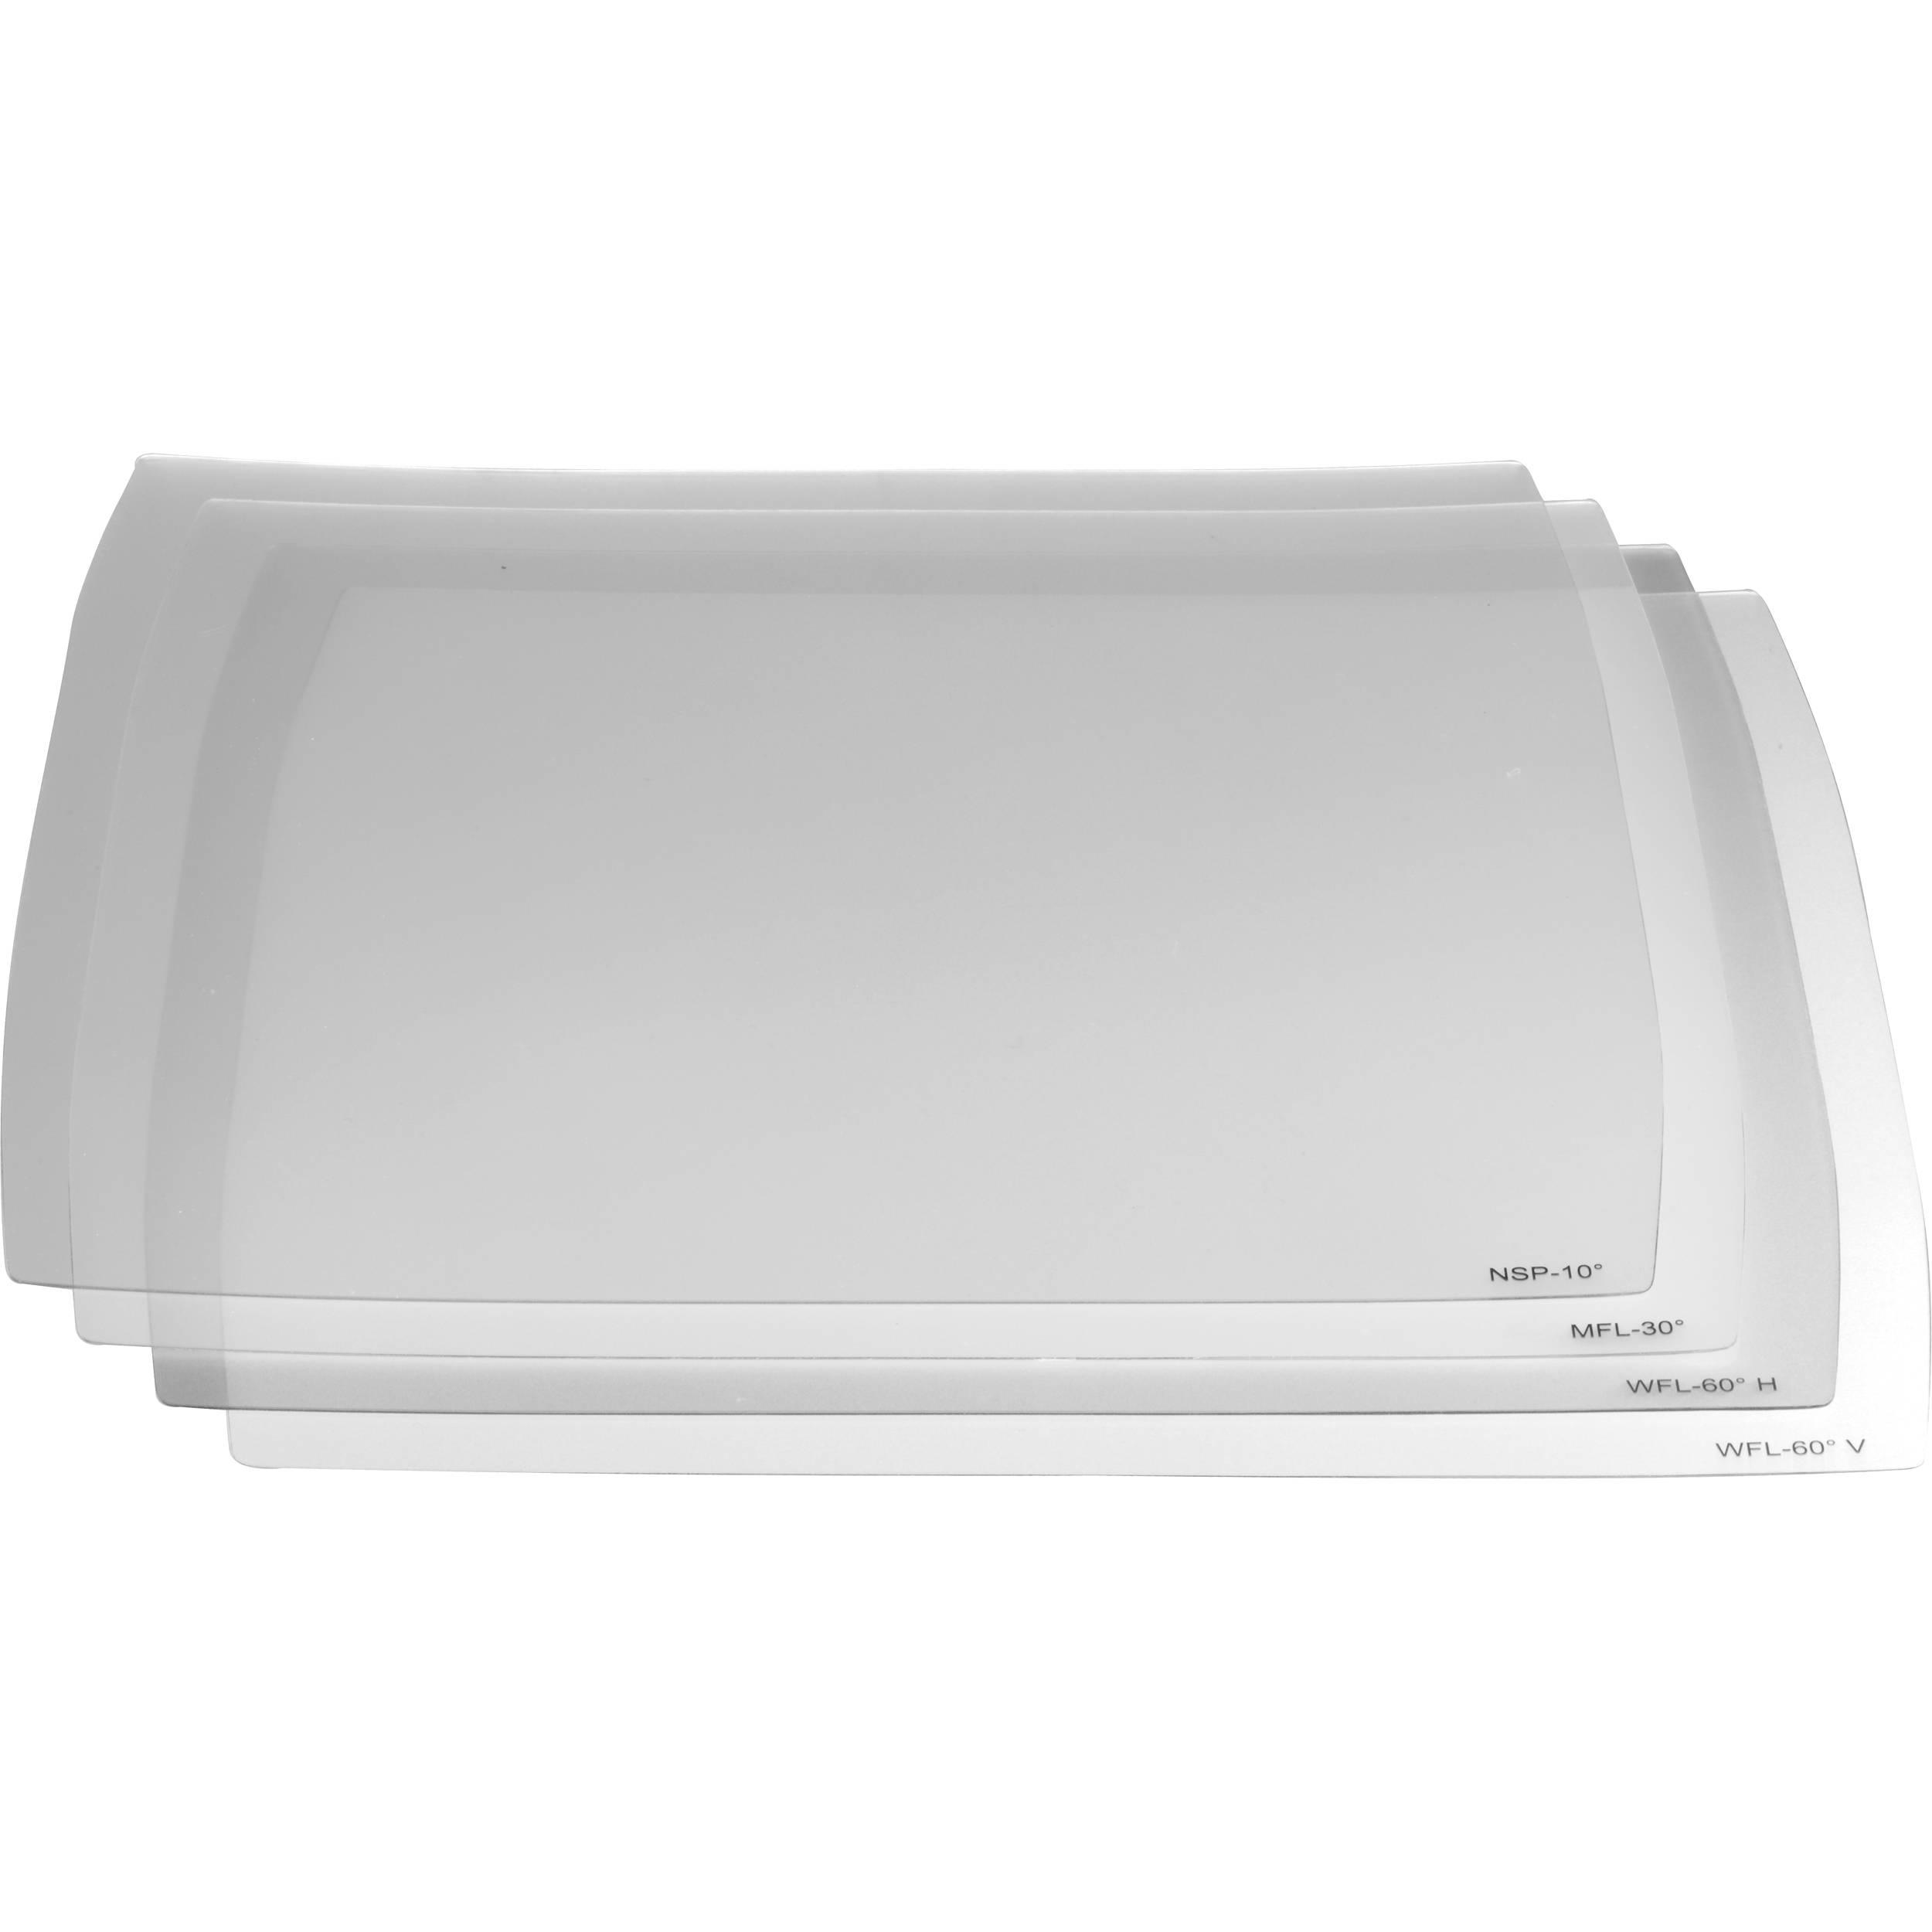 Litepanels Nanoptic Lens Set For Astra 1 X Led Panel 900 3506 8 Fuse Box